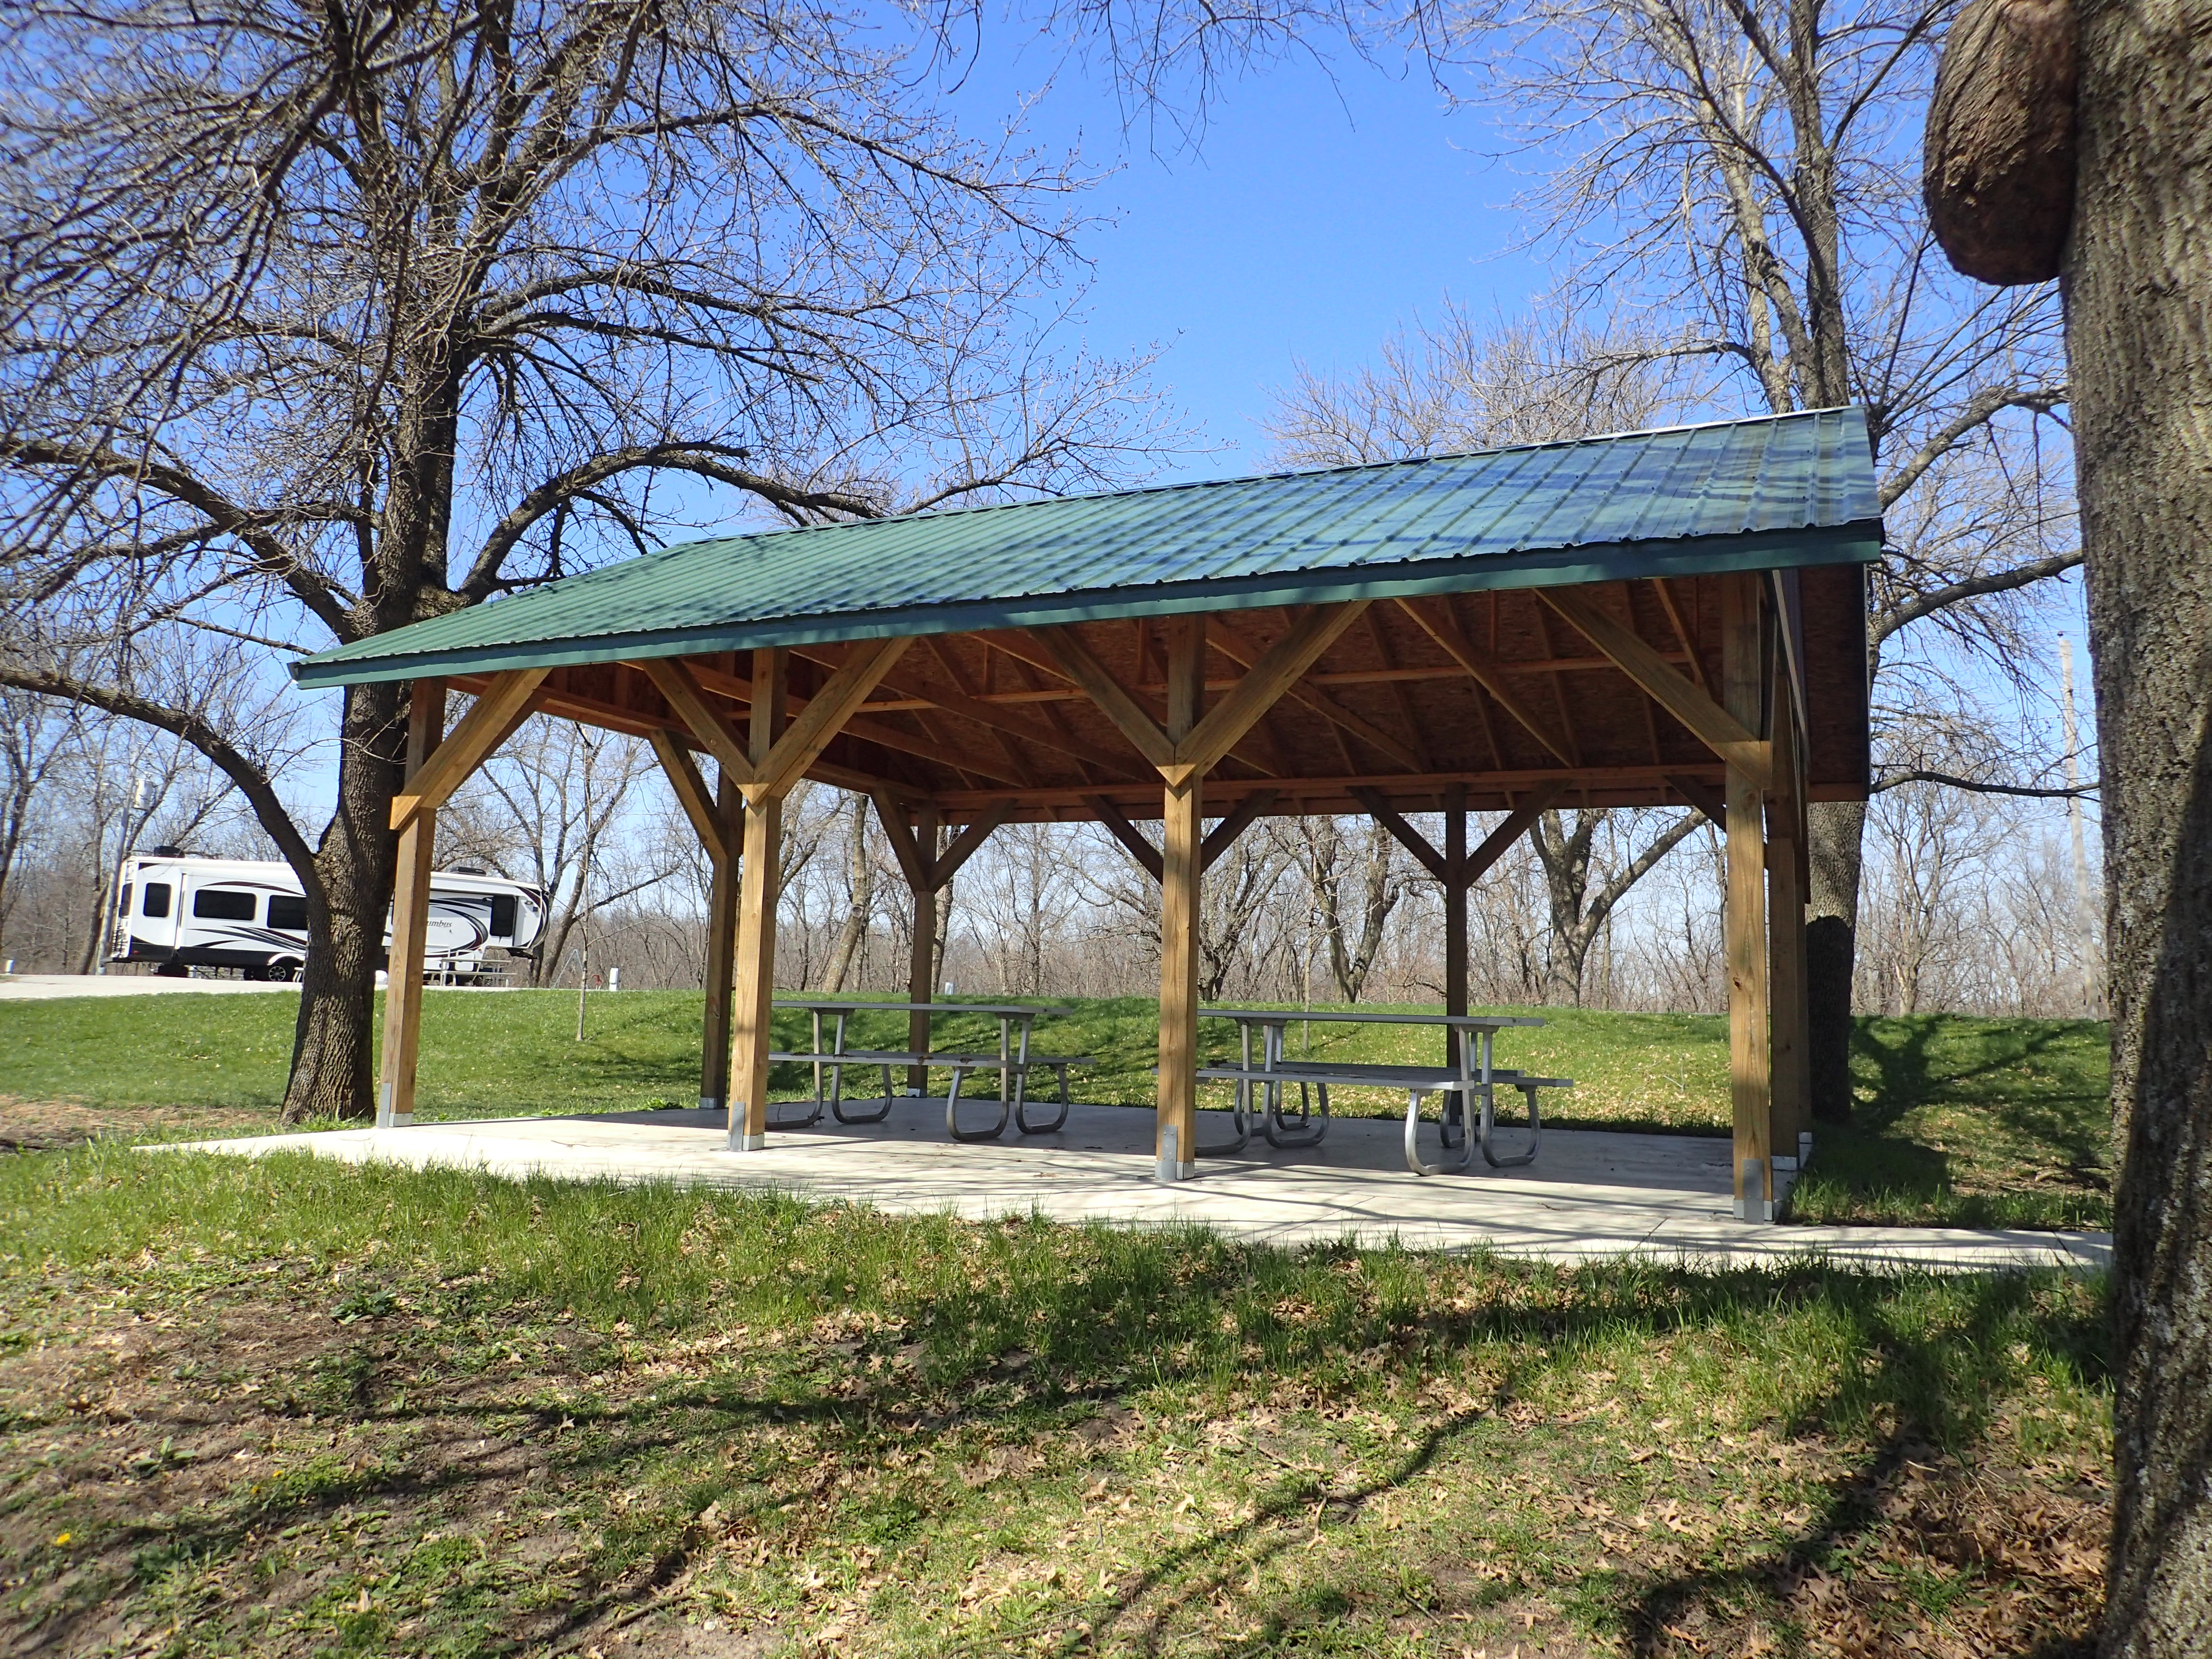 Dale Noyes Memorial Pavilion